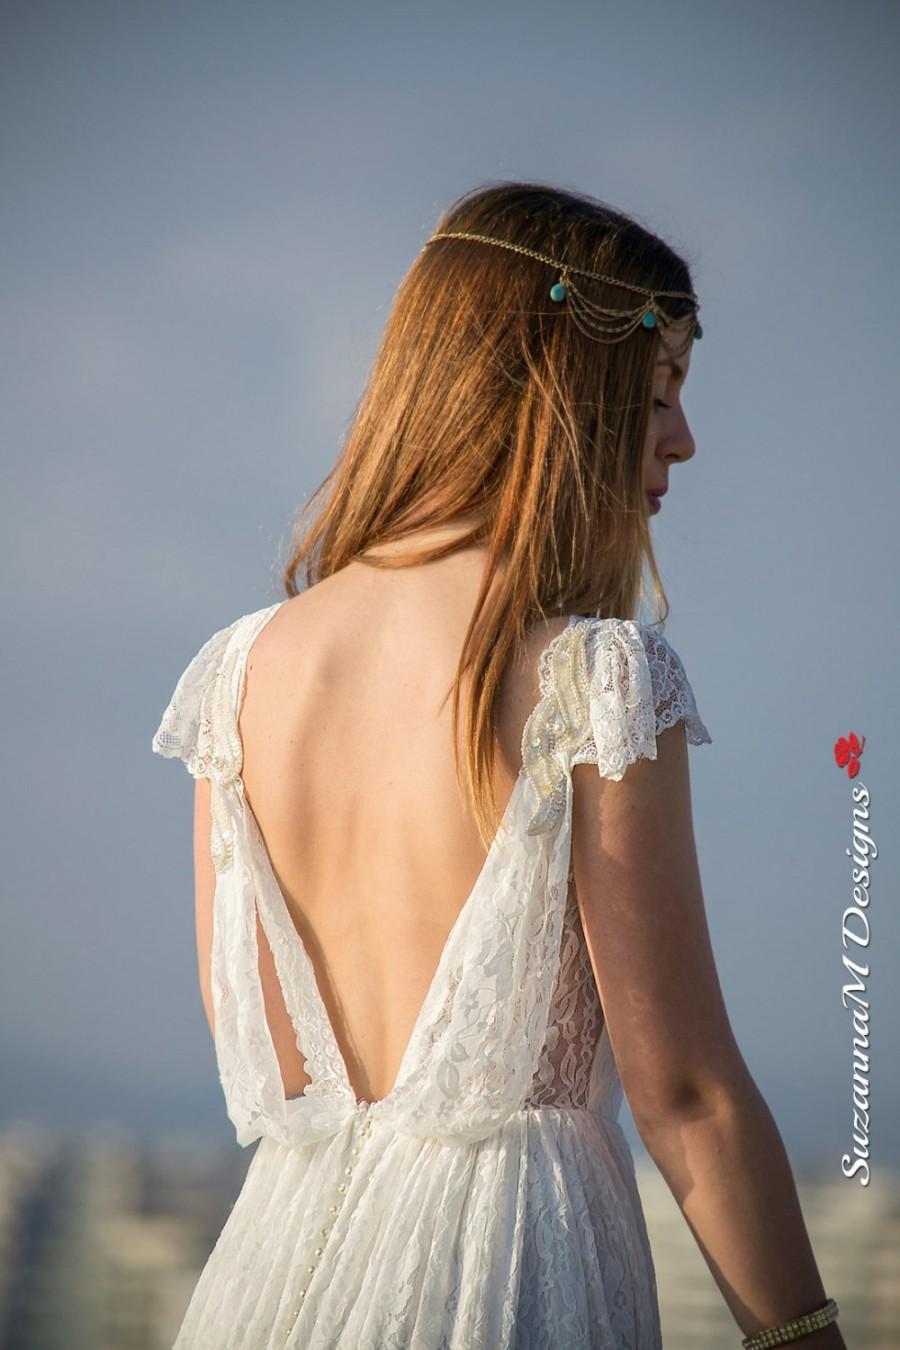 Wedding - Wedding Dress, Bohemian Wedding Gown, Boho Bridal Dress, Long Wedding Dress, Ivory Lace Dress, Lace Wedding Dress Handmade bySuzannaMDesigns